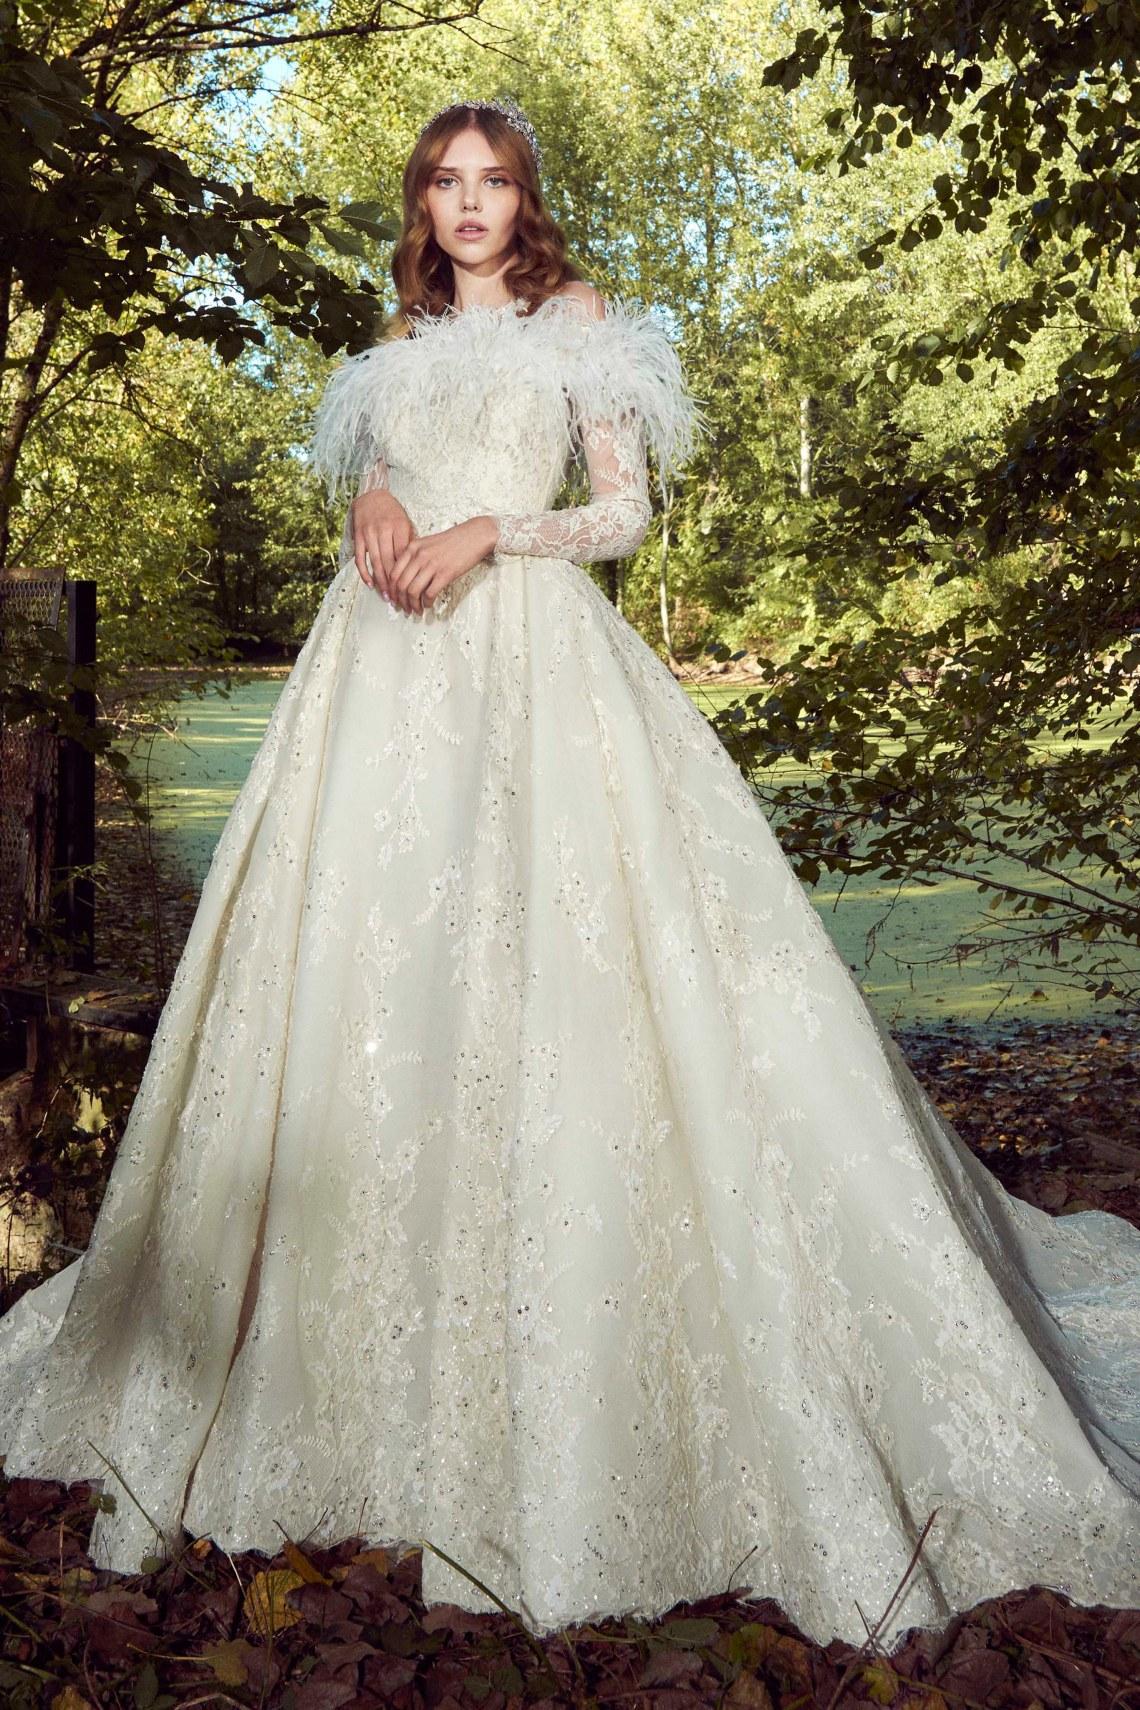 Vestidos de novia con plumas 2019